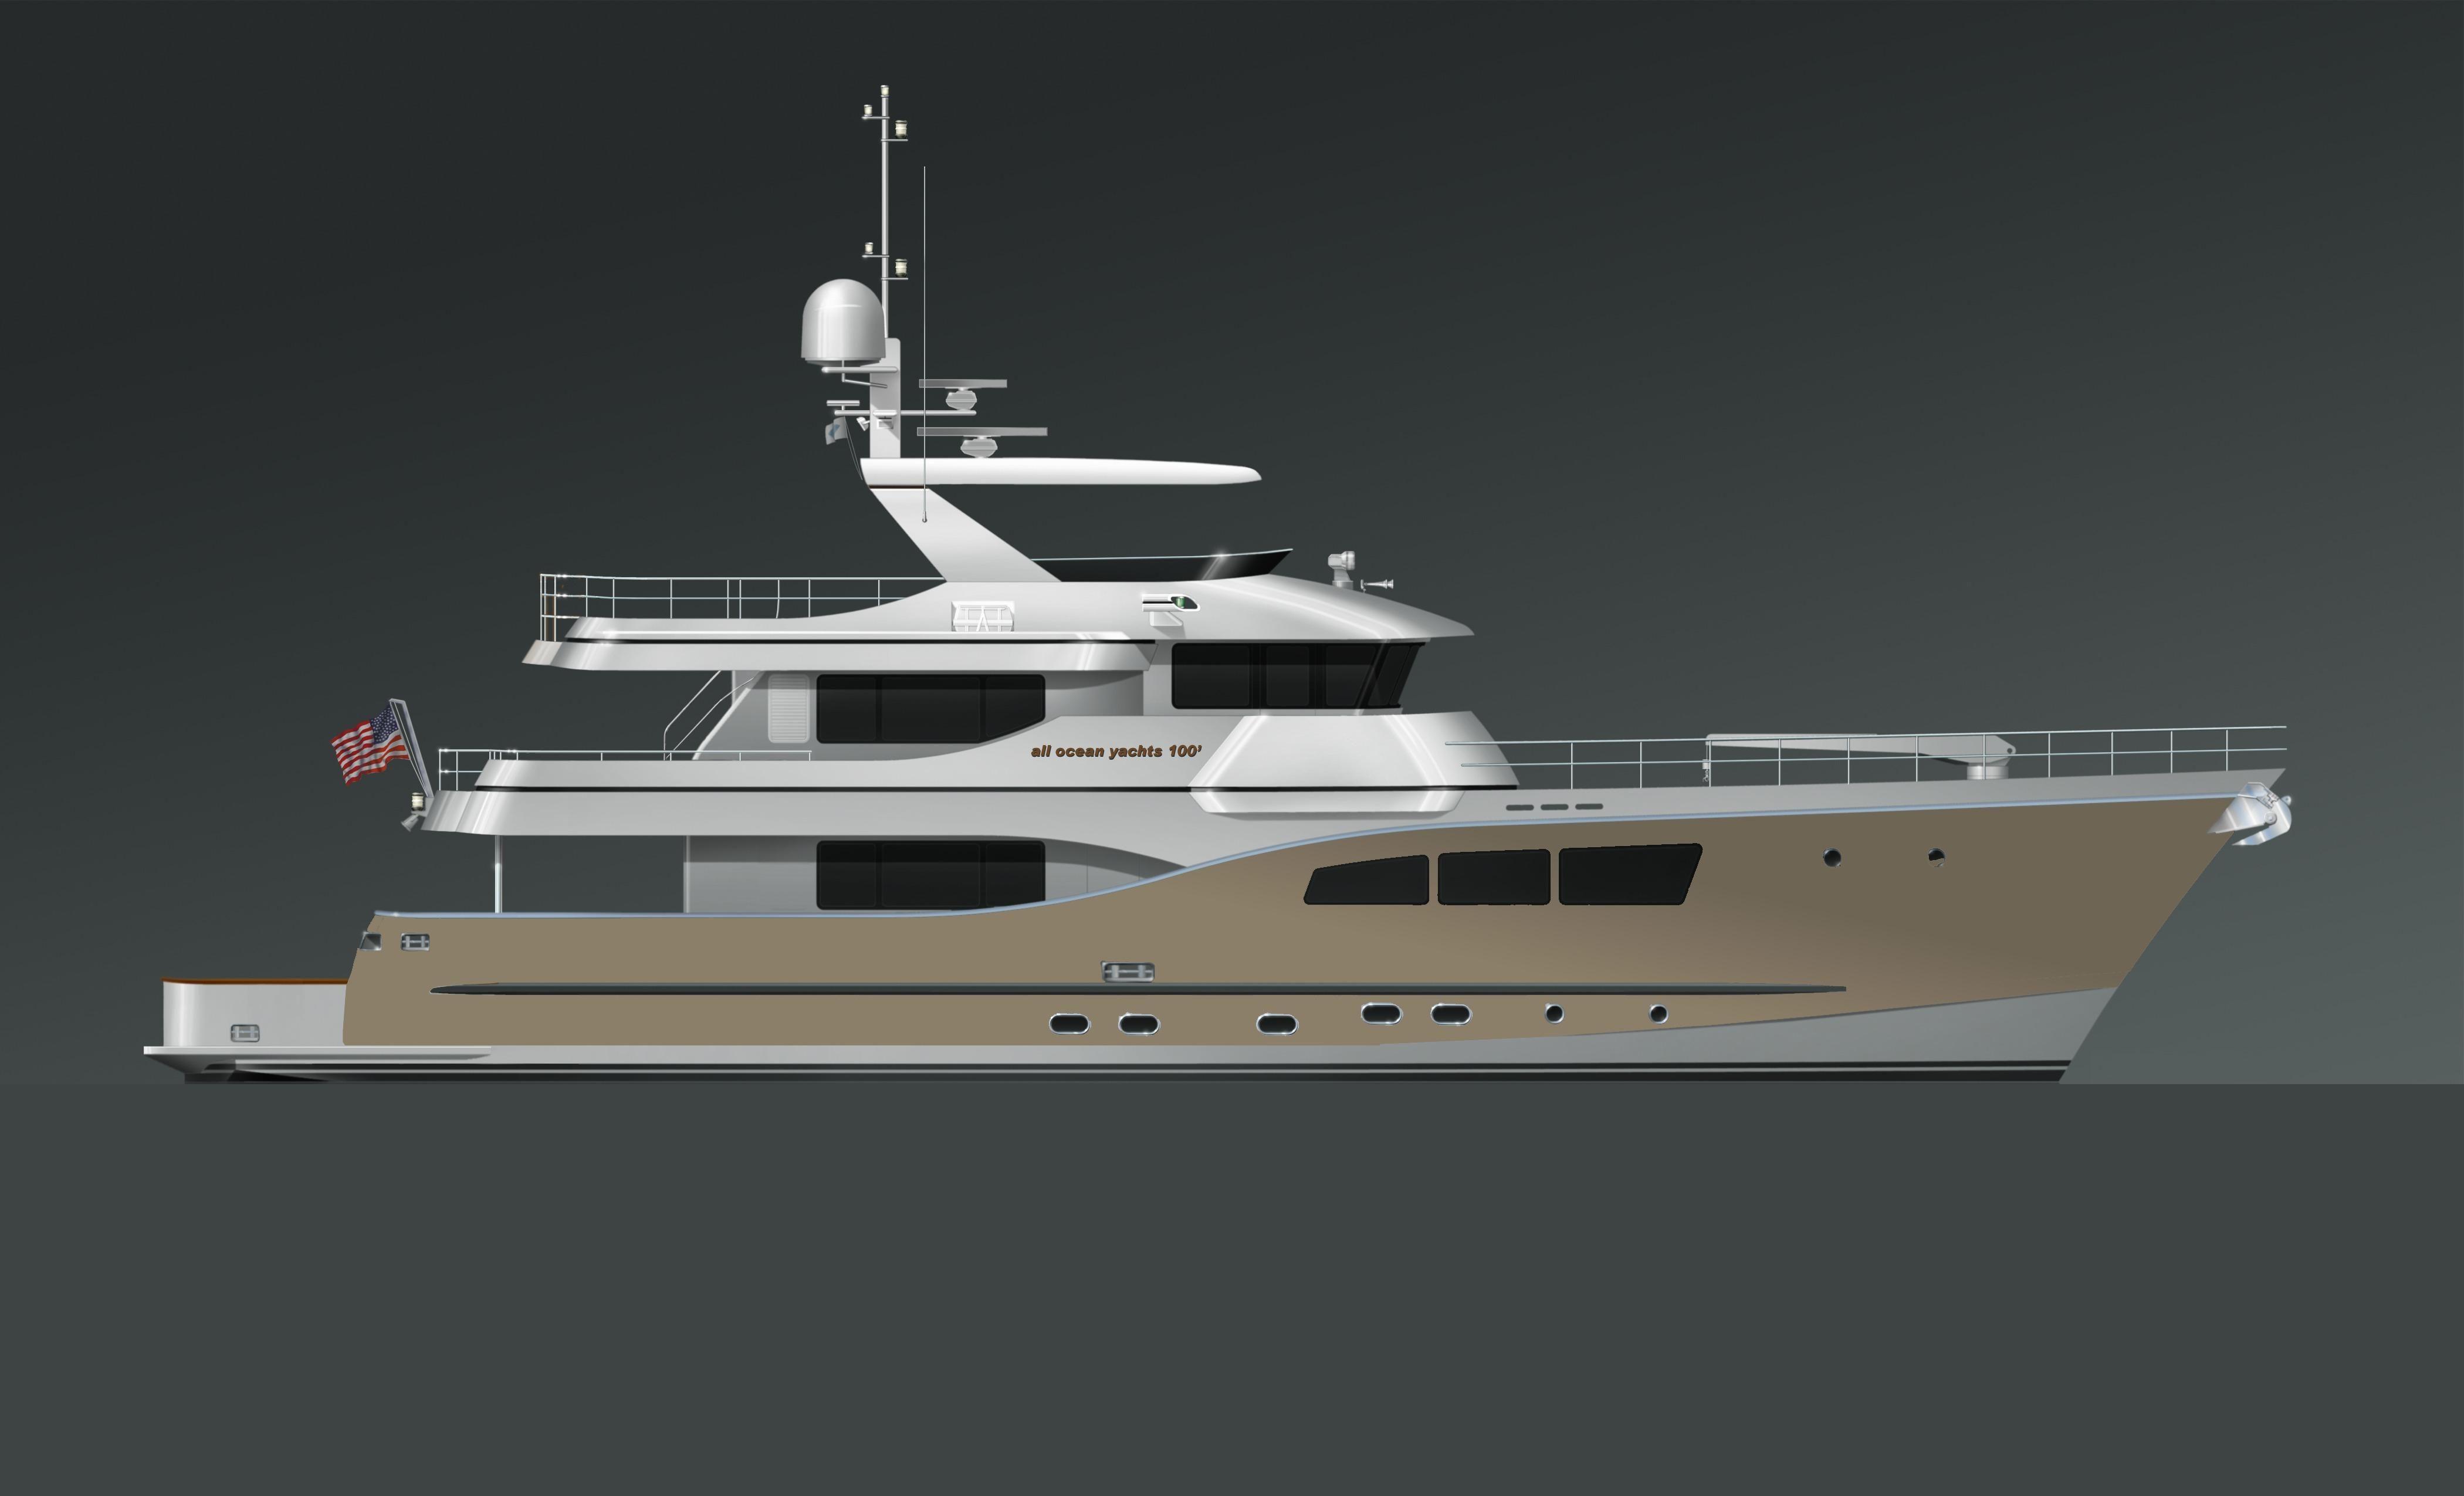 2019 All Ocean Yachts Tri-Deck Explorer Yacht Motor Boot zum Verkauf -